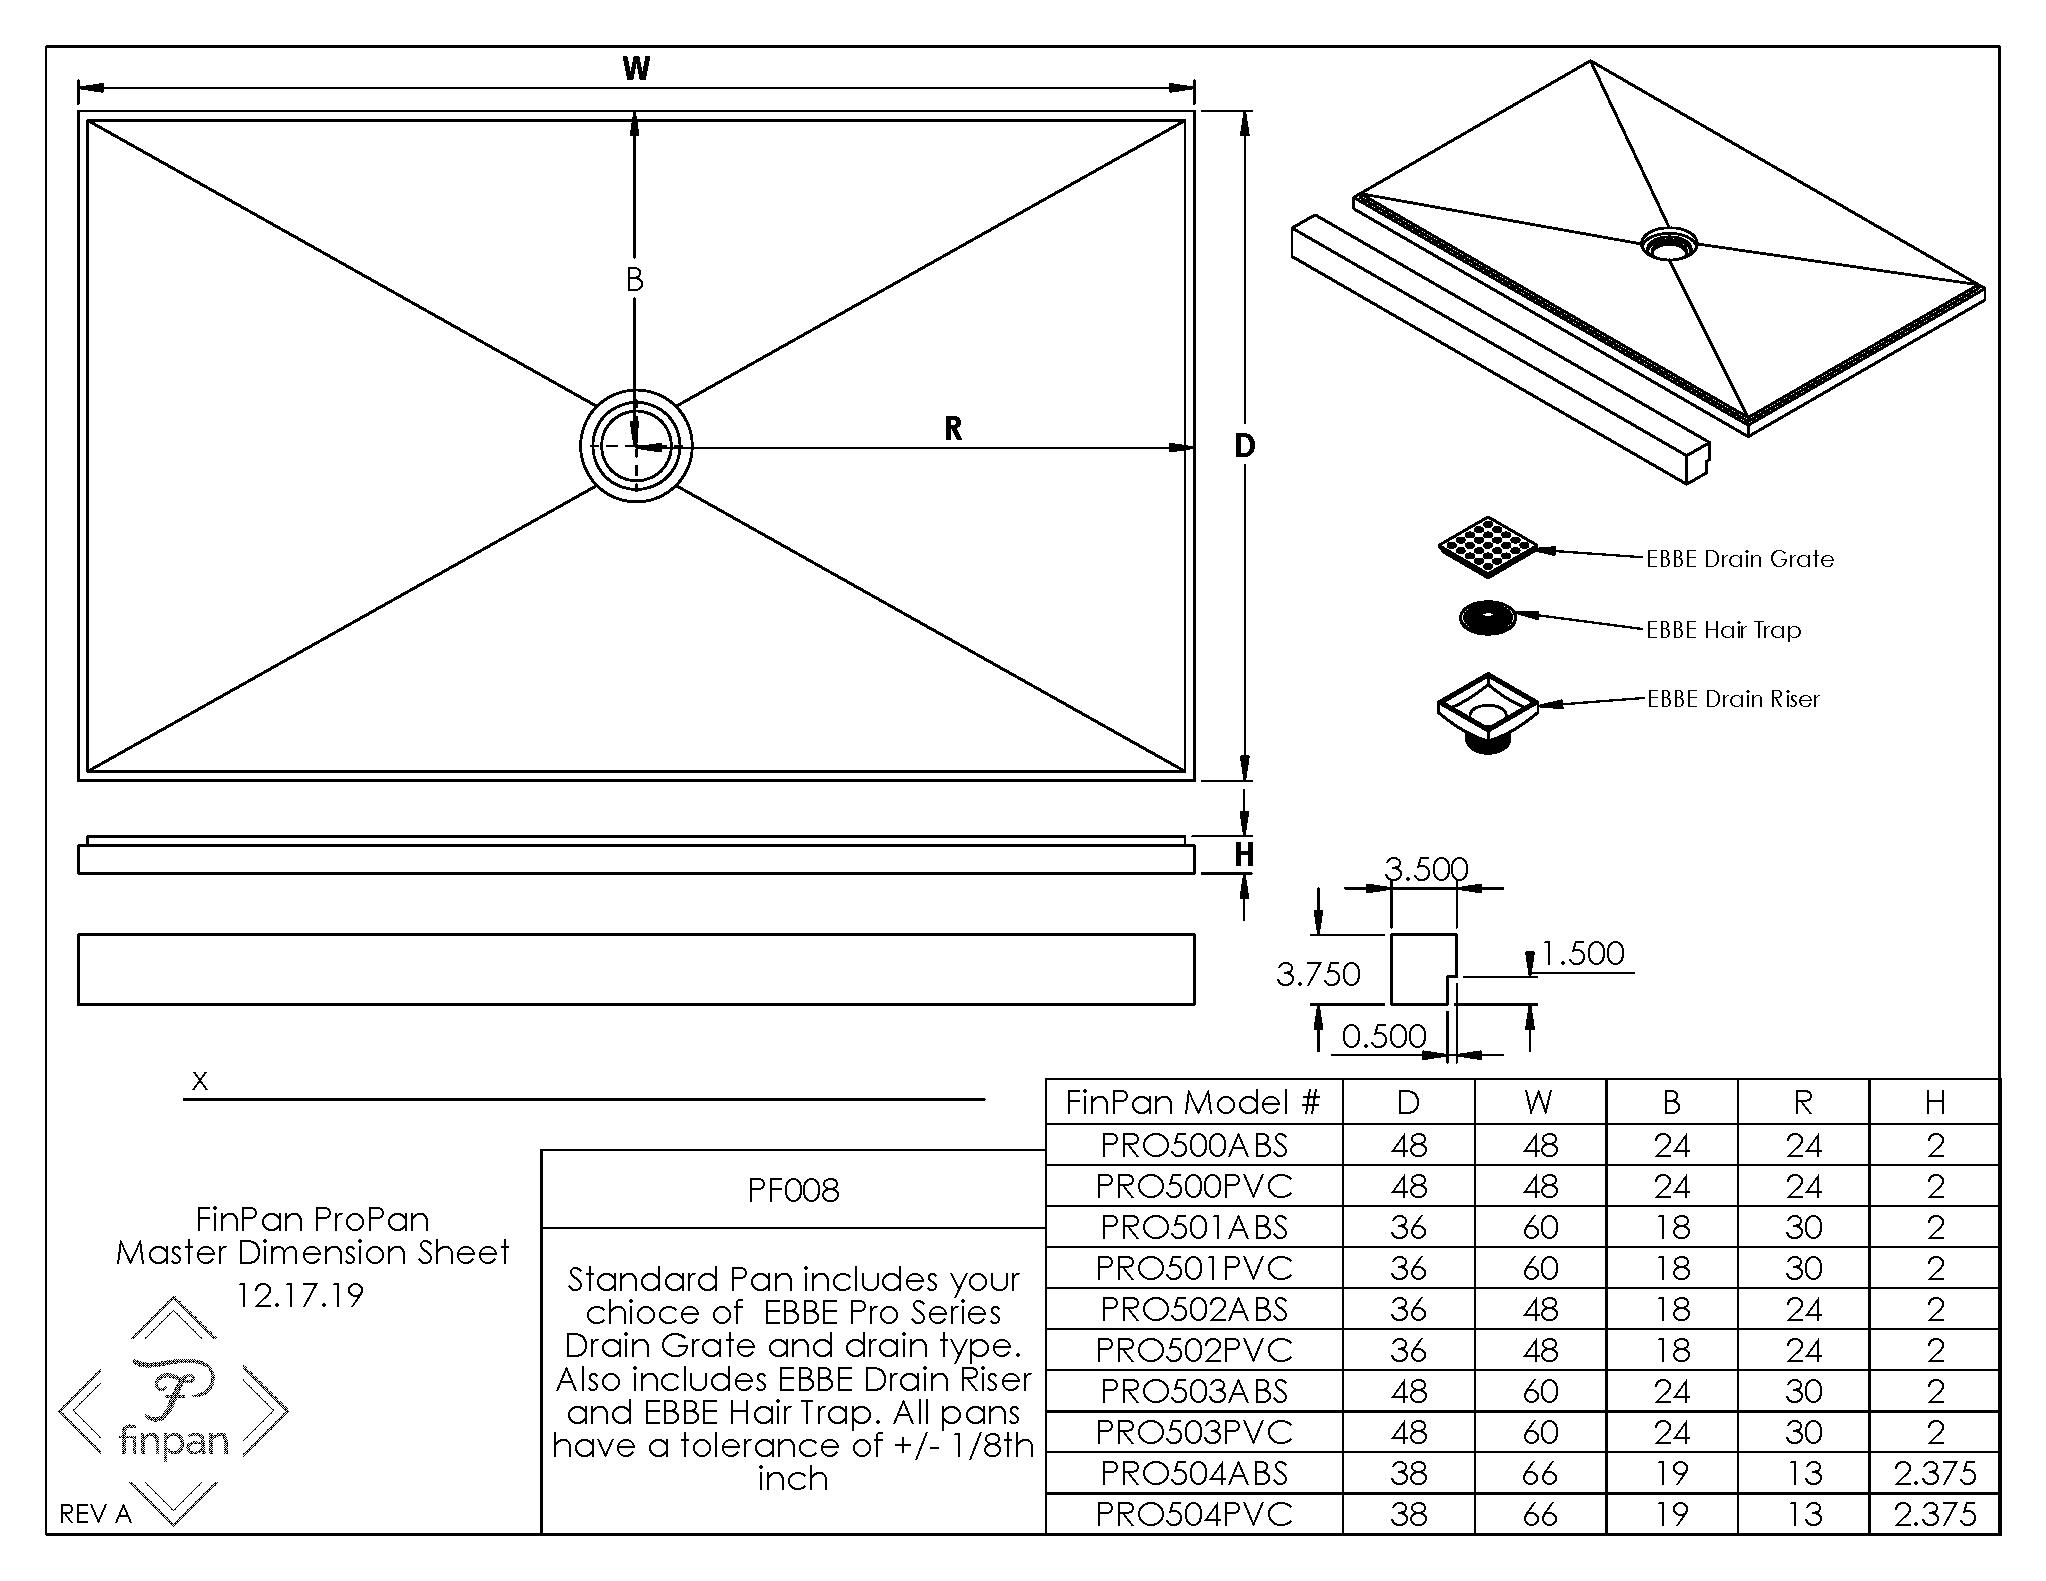 ProPan Master Dimension Sheet